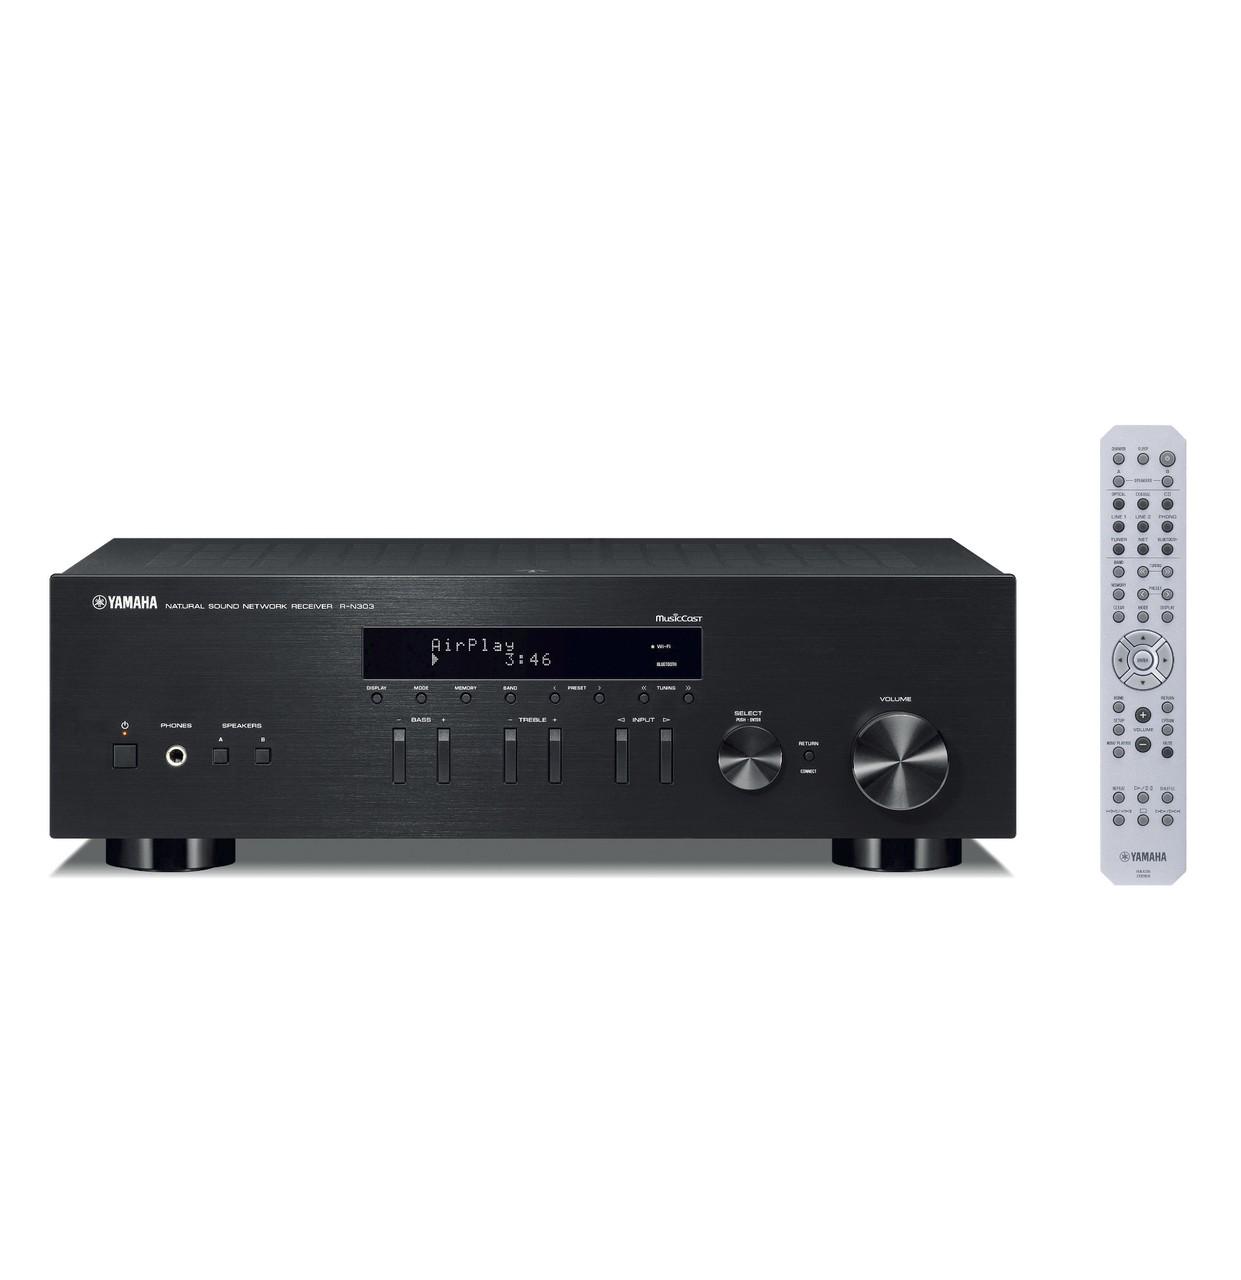 Yamaha R-n303 Receiver Stereo Wi-Fi Bluetooth